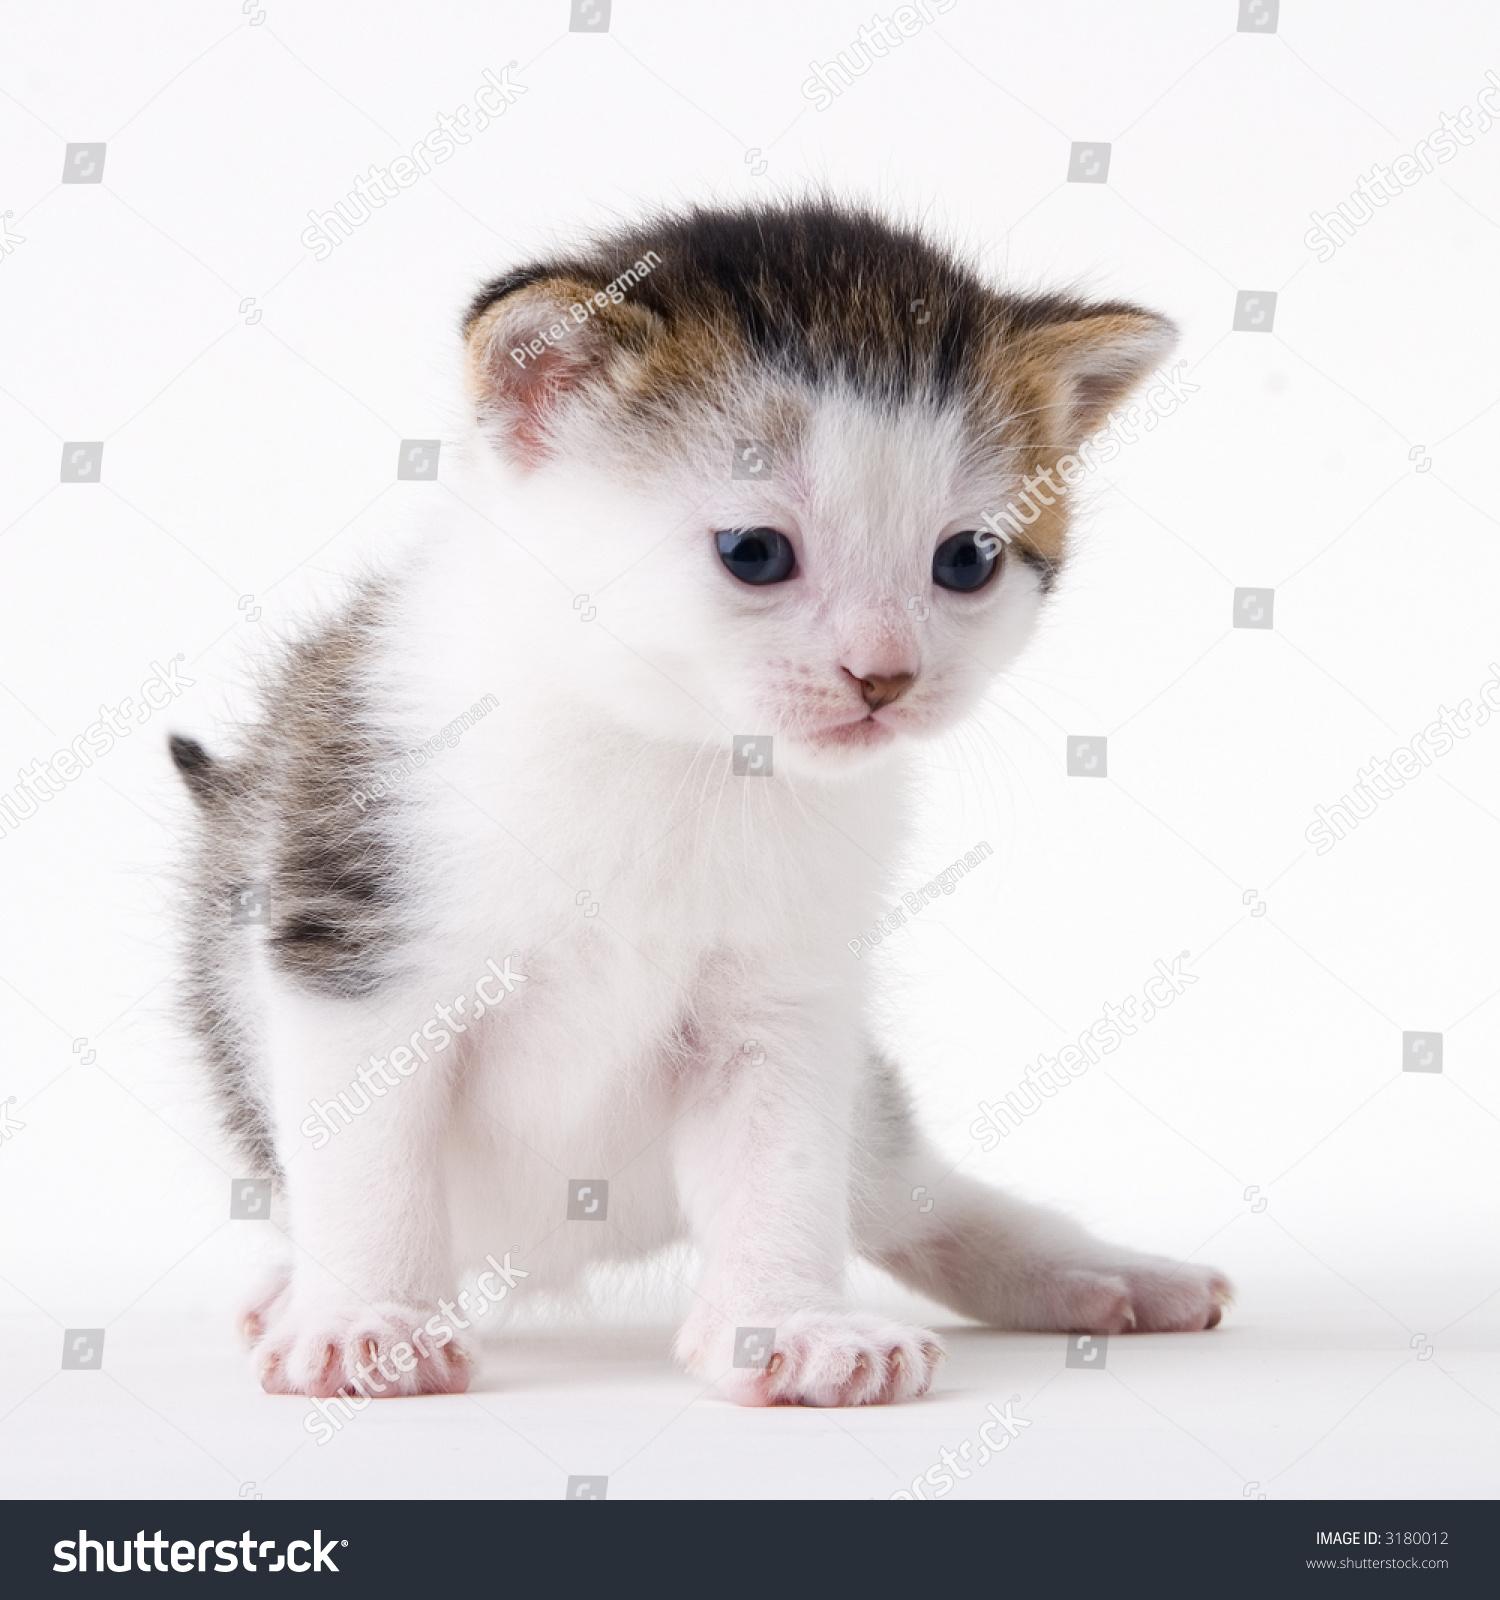 Young Adorable Kitten Posing My Studio Stock